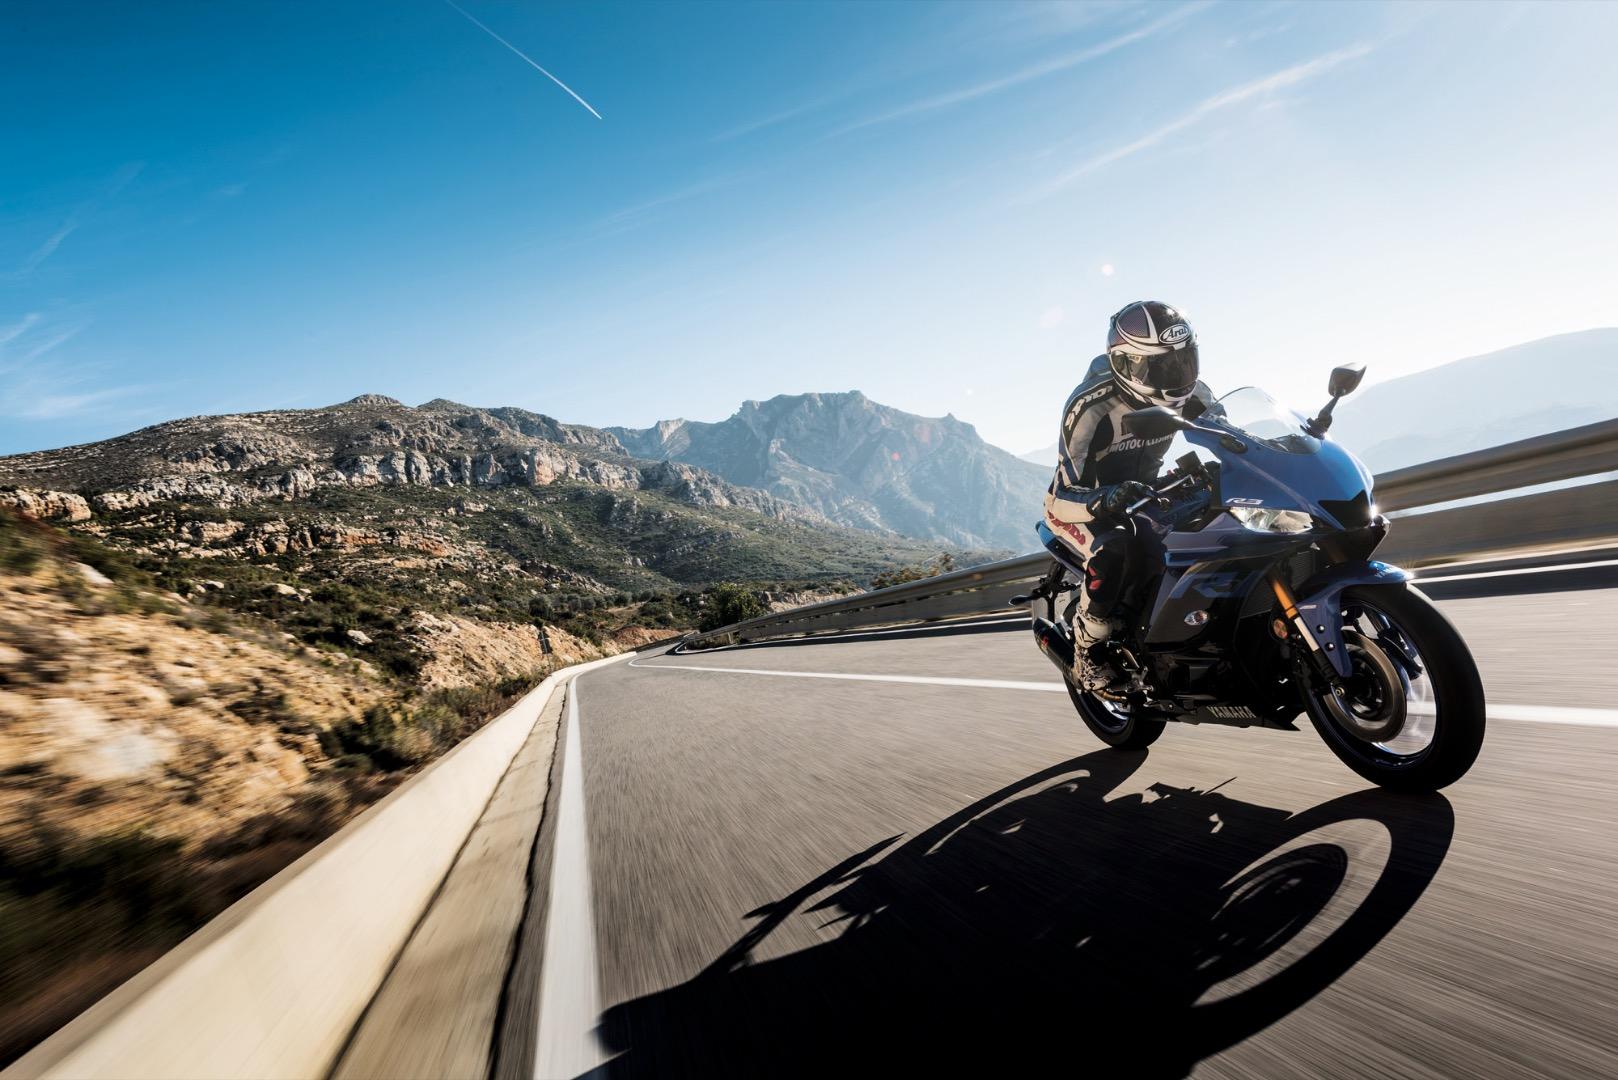 Yamaha YZF-R125 & YZF-R3 2019, prueba y primeras impresiones